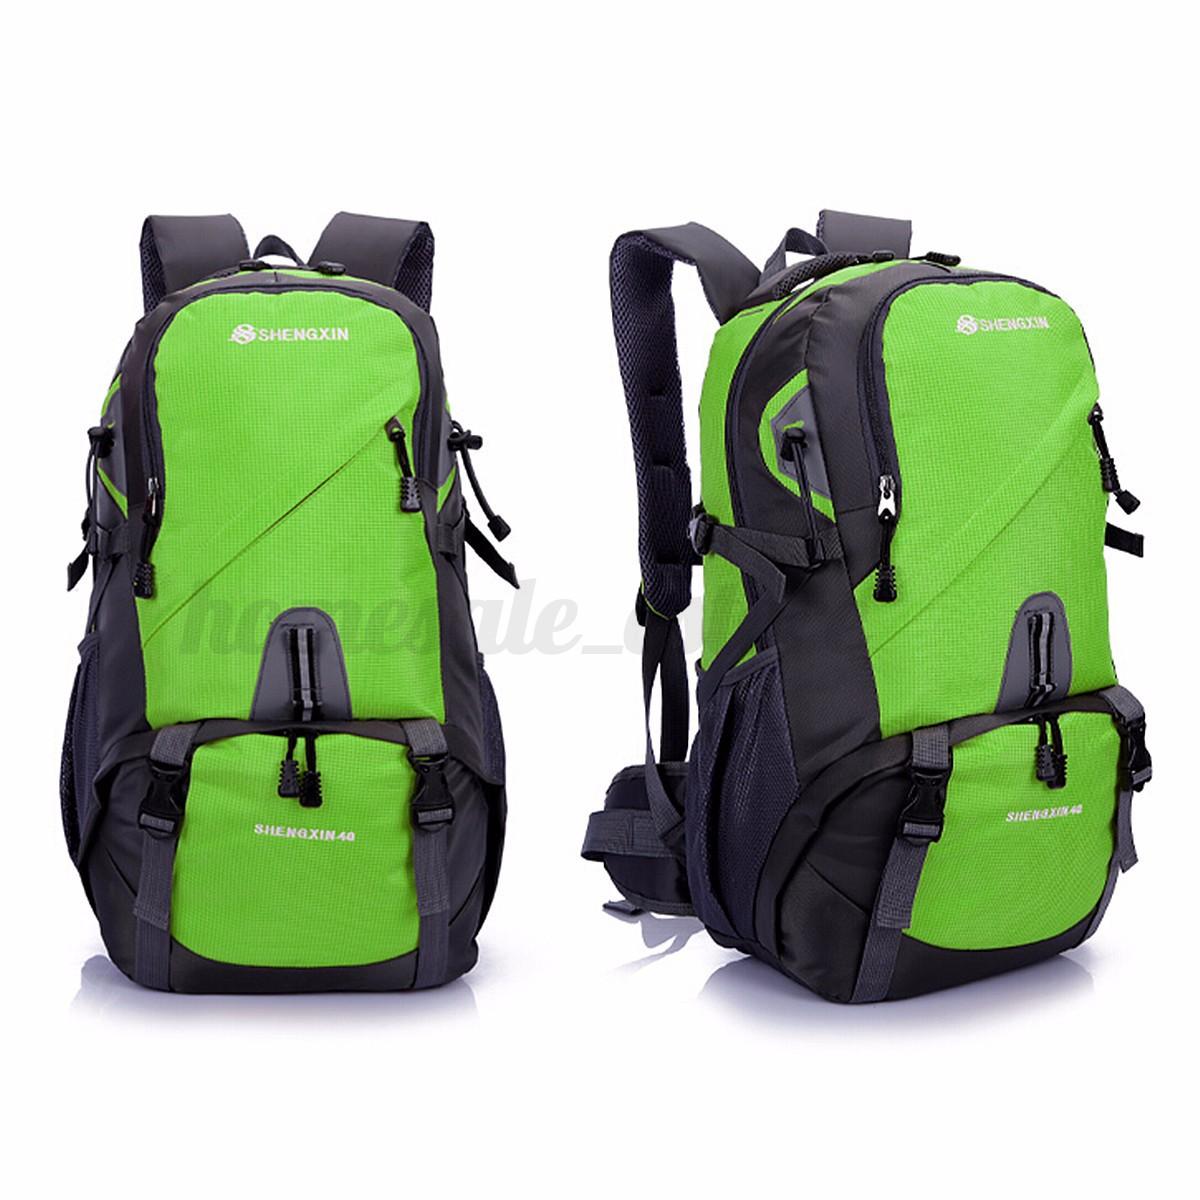 40L Women Men Waterproof Travel Camping Sports Hiking Daypack Outdoor Backpack